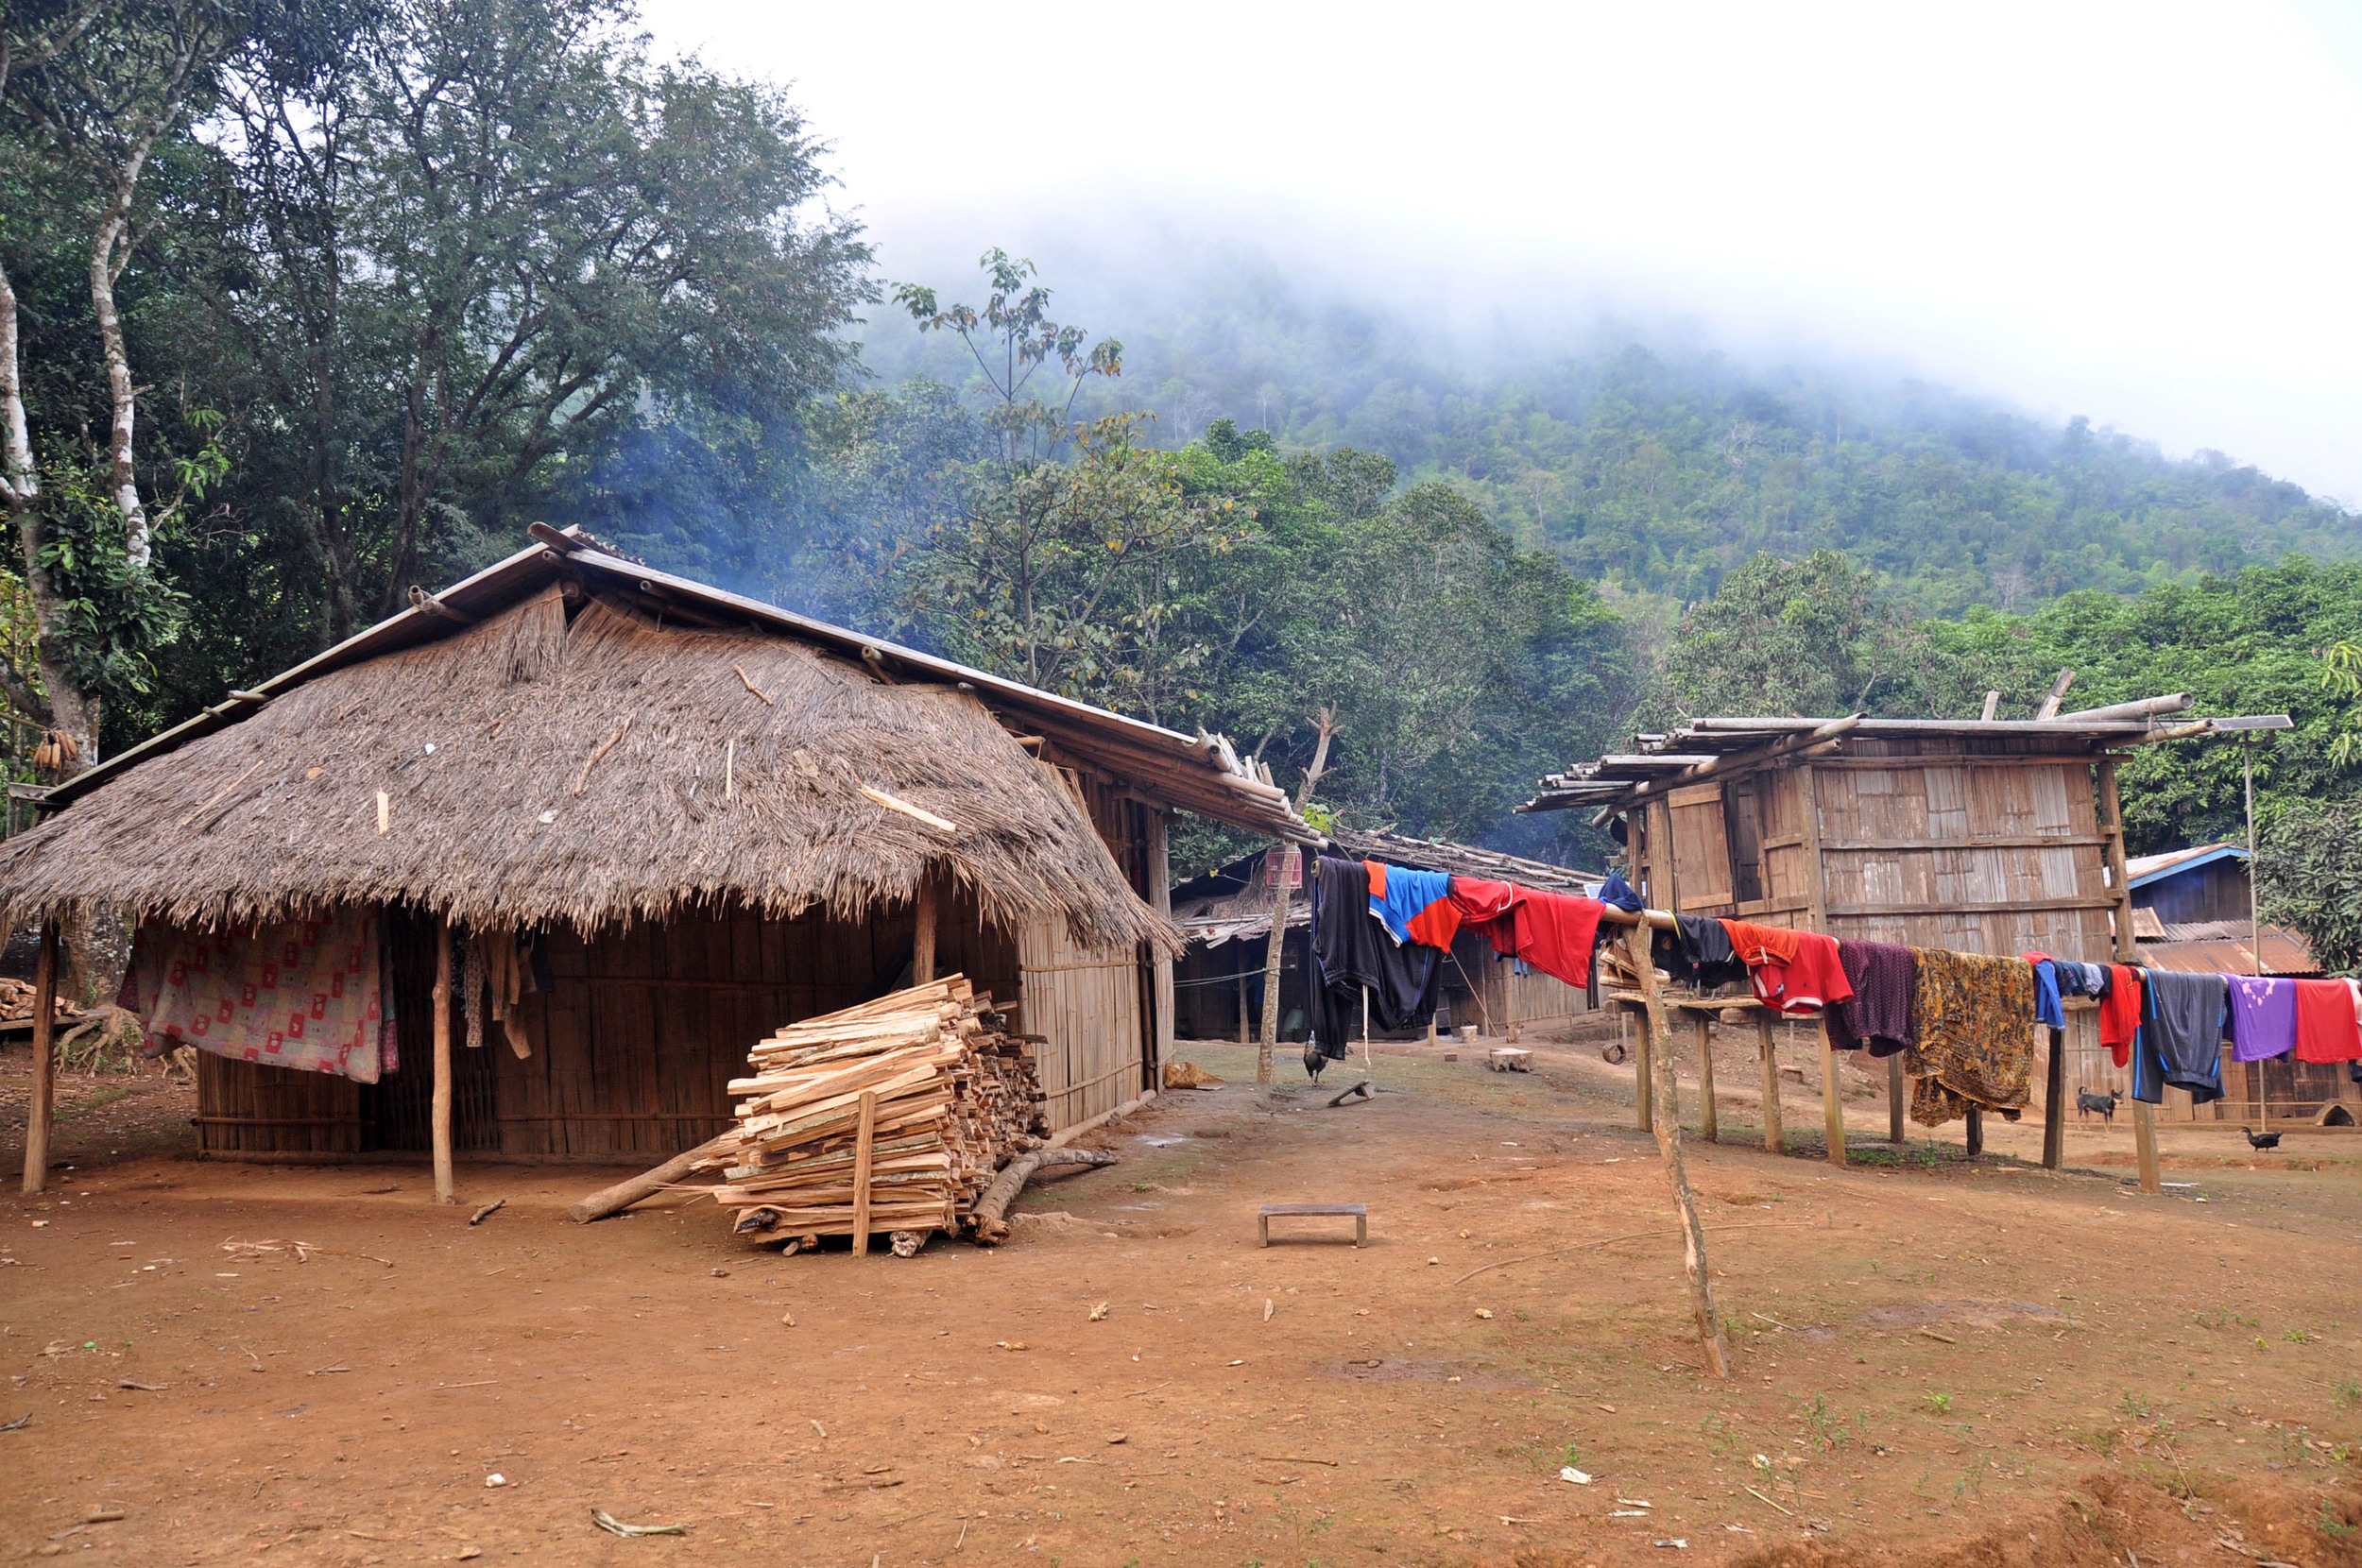 Remote Hill Tribe Trek in Laos White Elephant Adventures